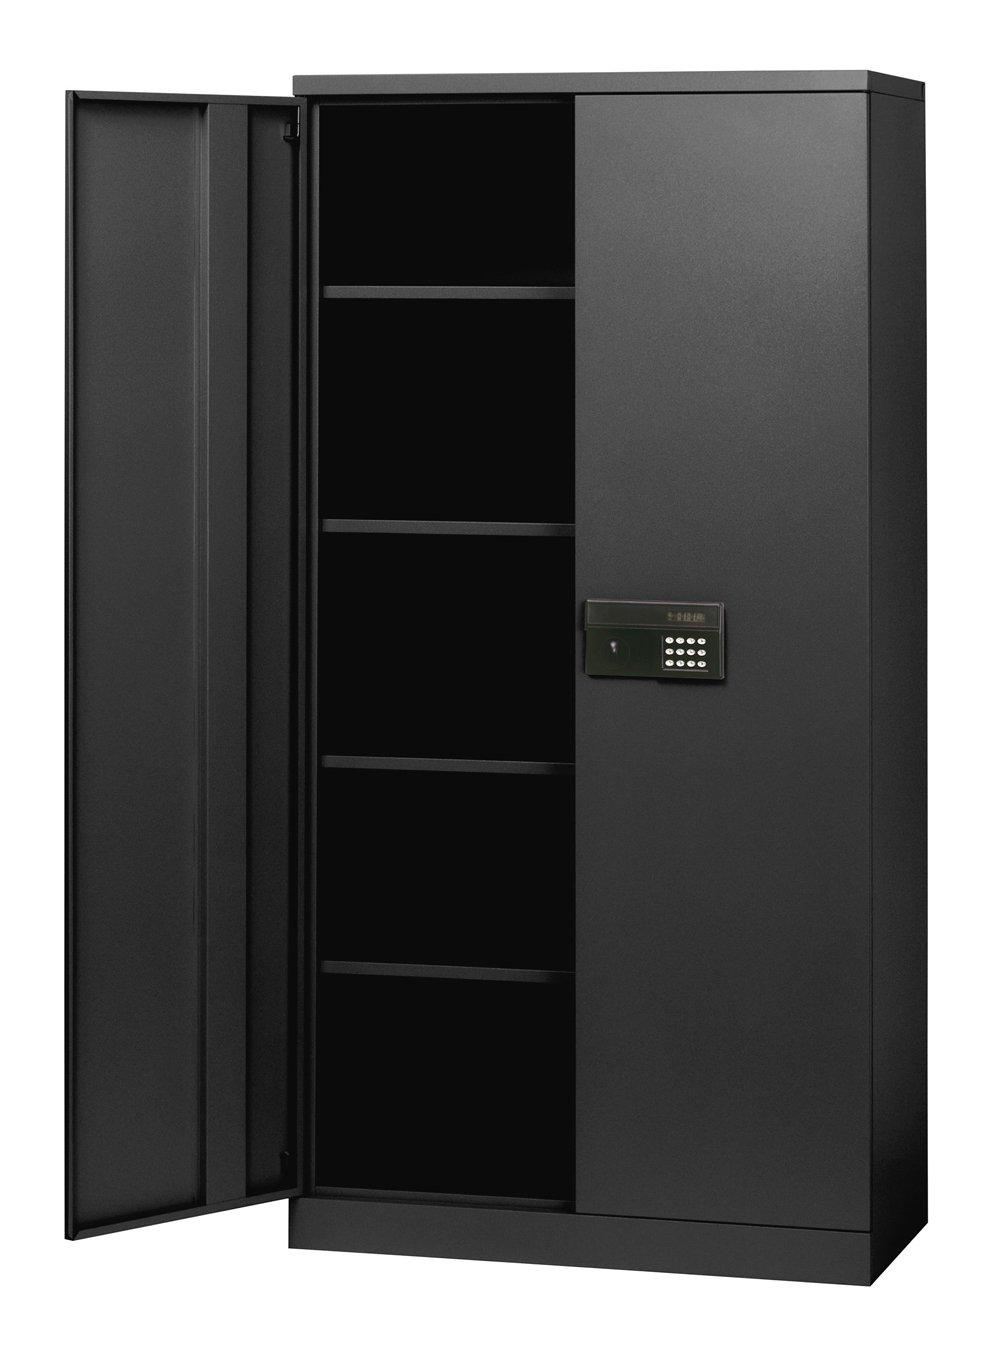 Sandusky Lee KDE7236-09 Black Steel SnapIt Storage Cabinet, Keyless Electronic Lock, 4 Adjustable Shelves, 72'' Height x 36'' Width x 18'' Depth